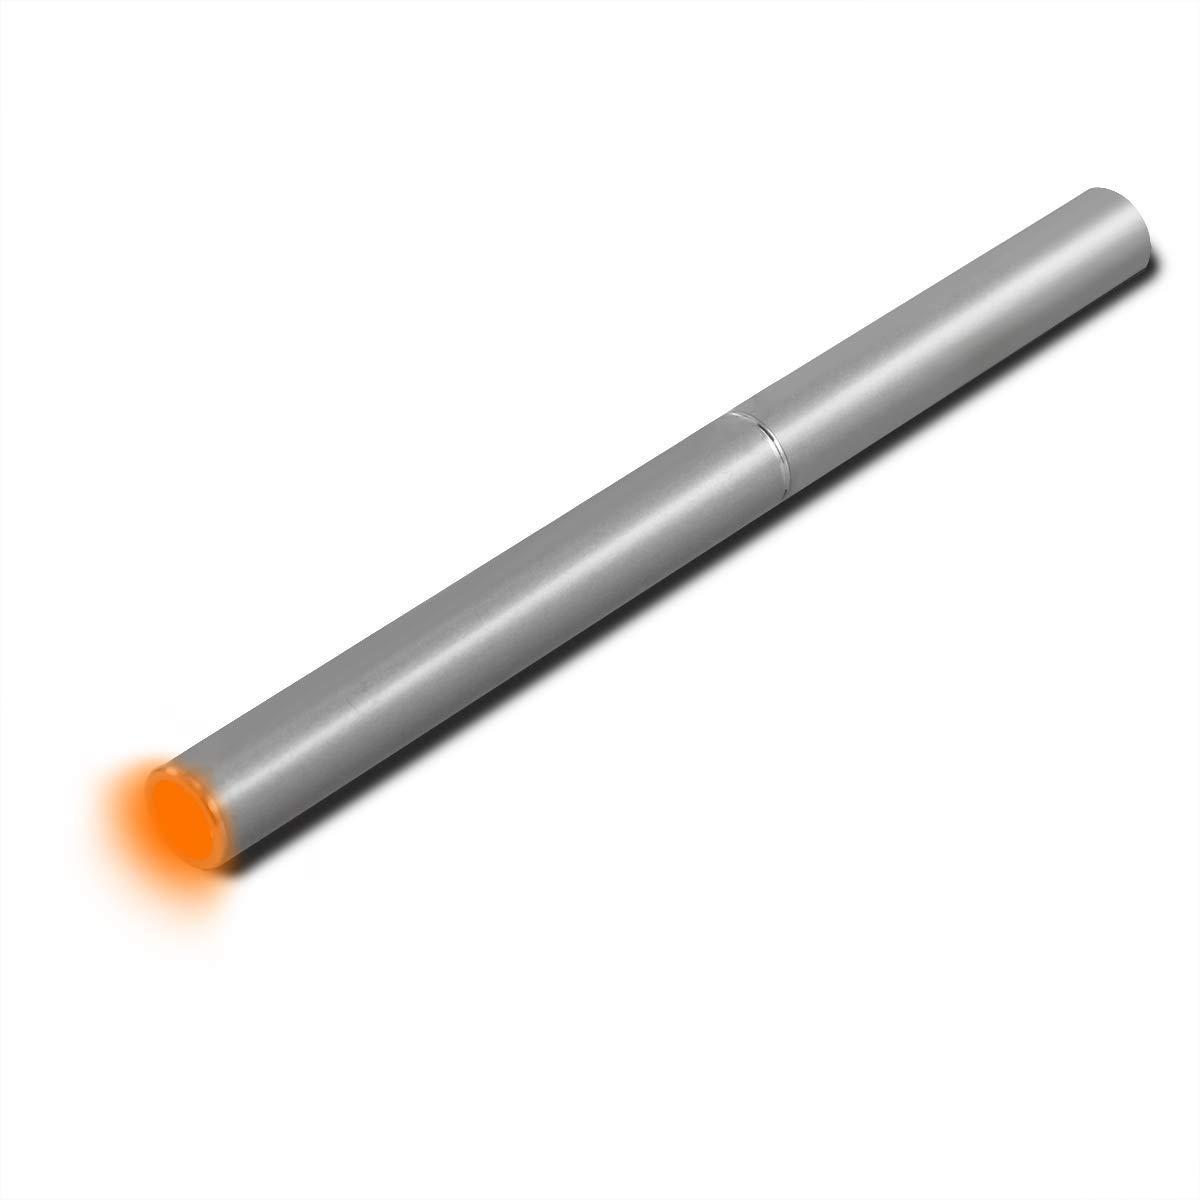 Aromatherapy Inhaler, Quit Smoking Remedy/Stop Smoking Aid to Help Quit Smoking/Therapeutic Quit Smoking Product/Best Stop Smoking Product